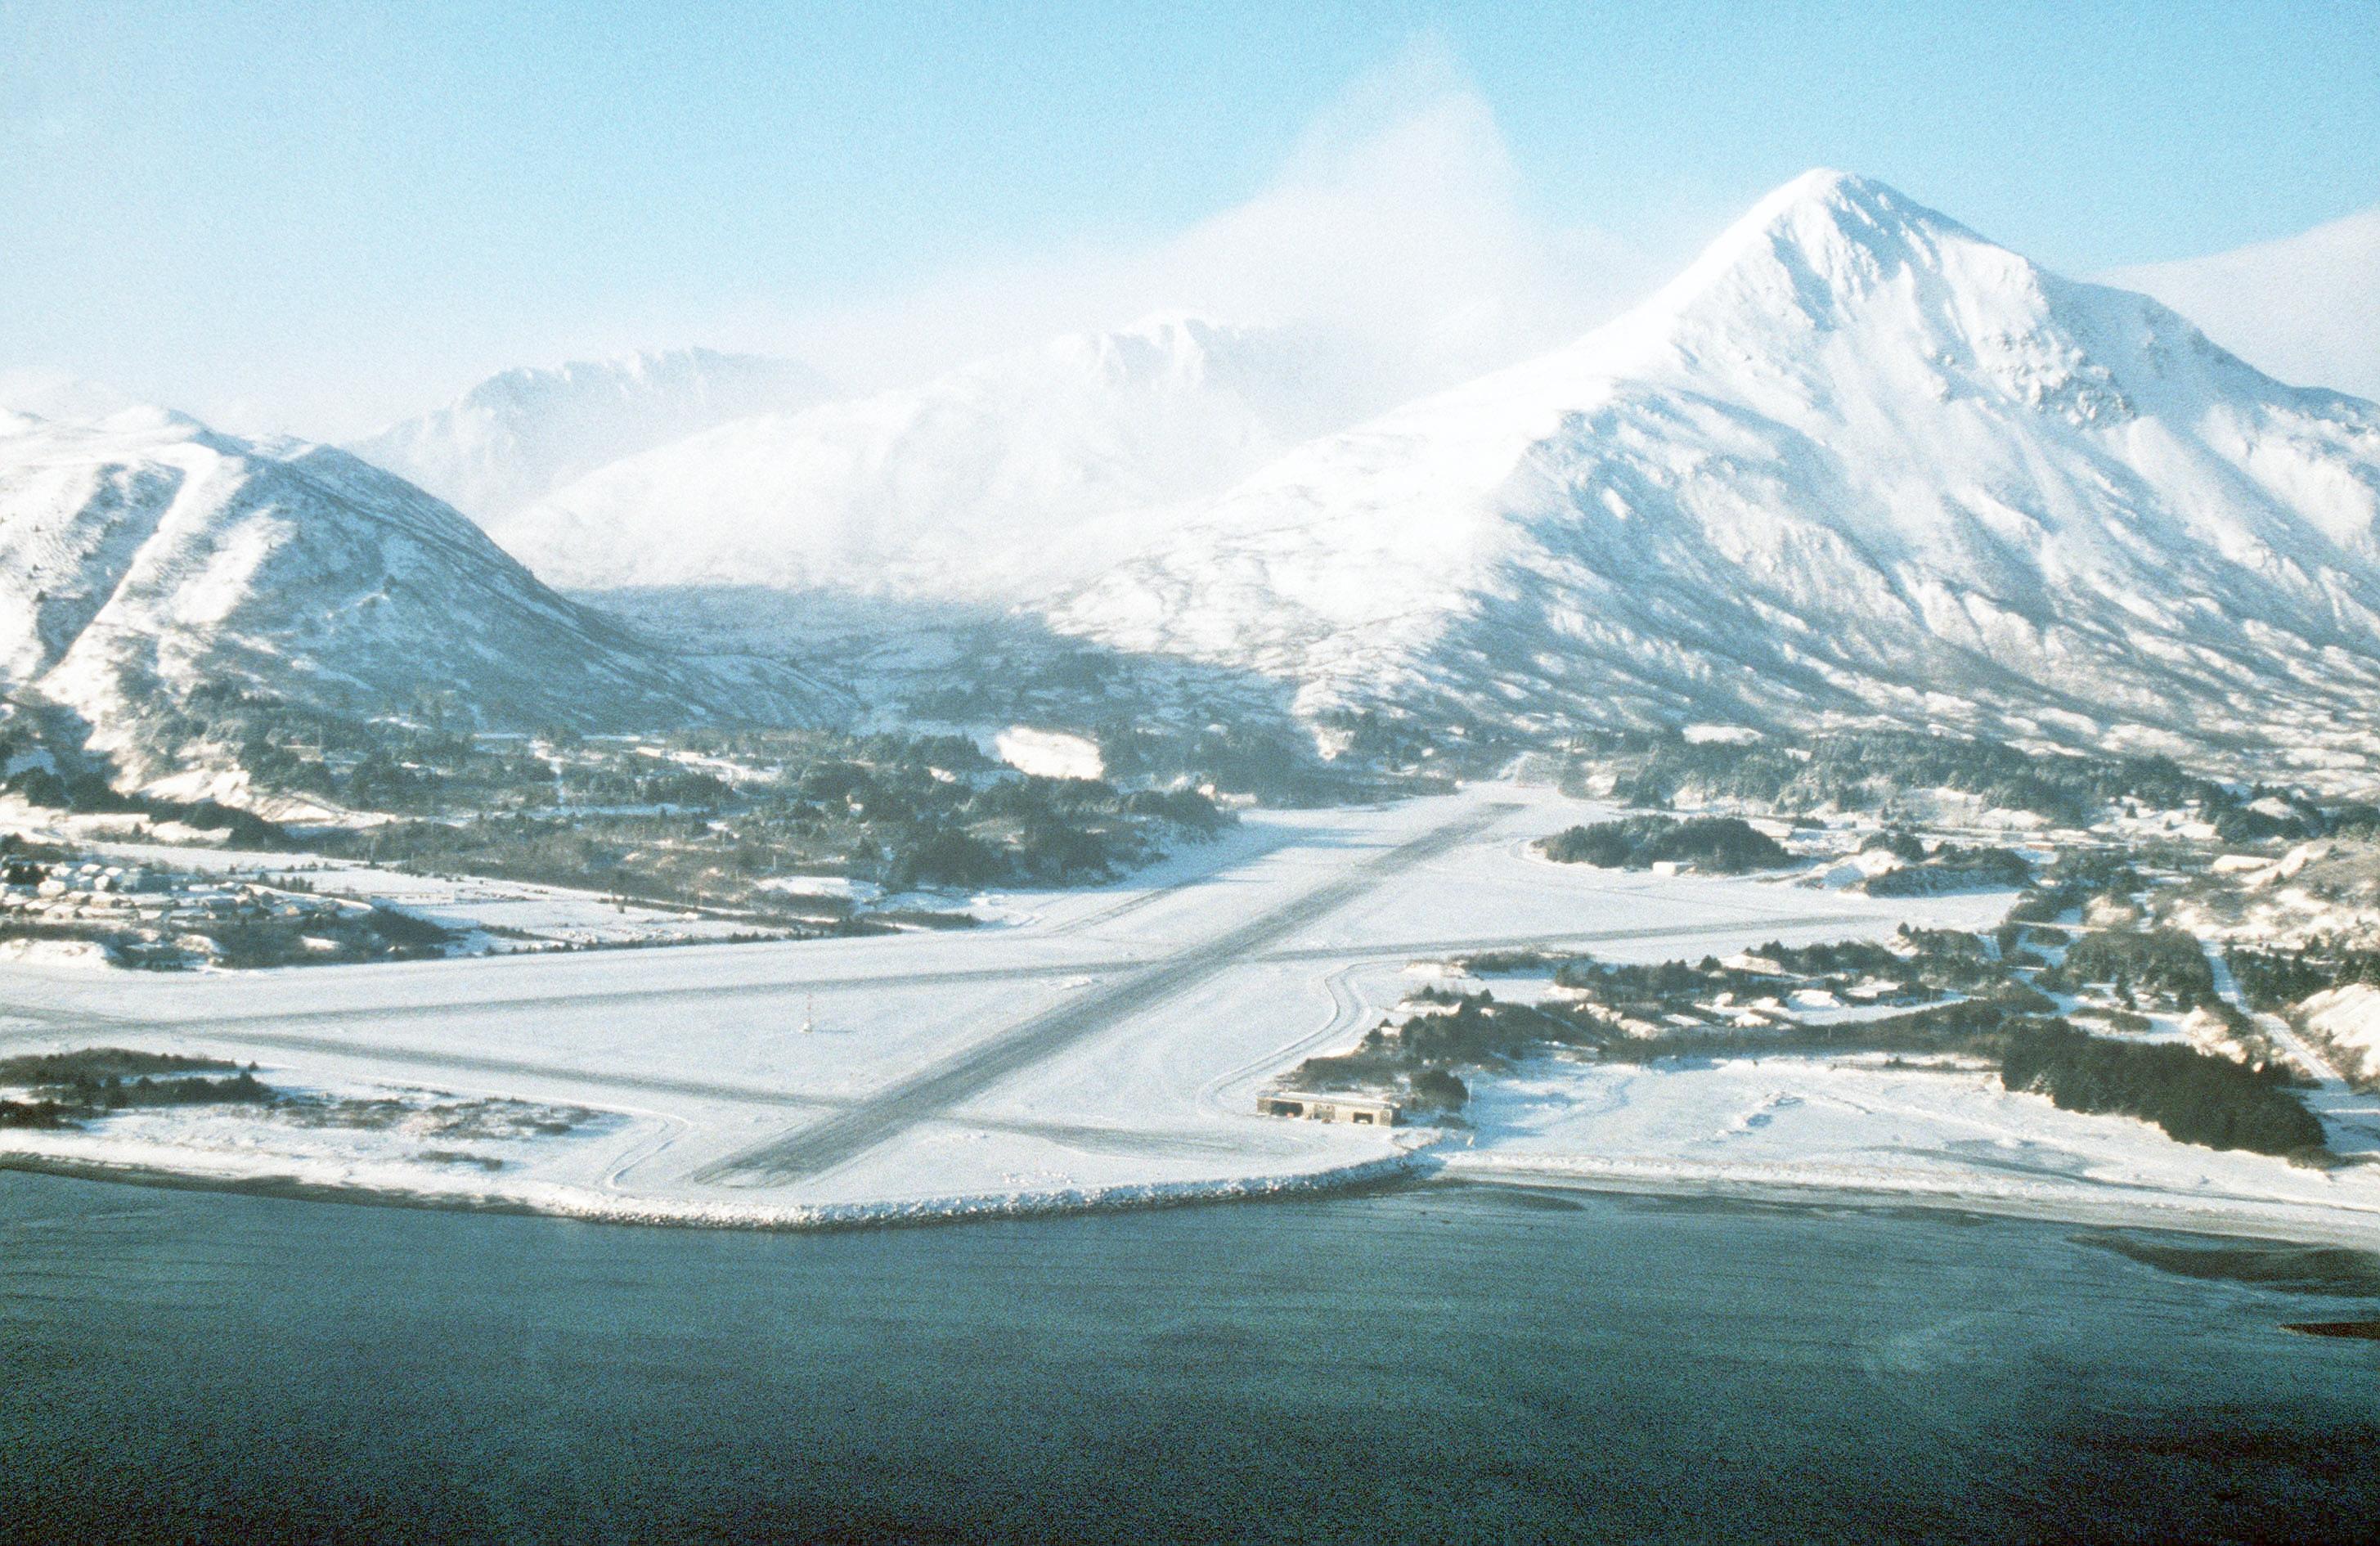 File:Kodiak Island Air Station 1.jpg - Wikimedia Commonskodiak island borough